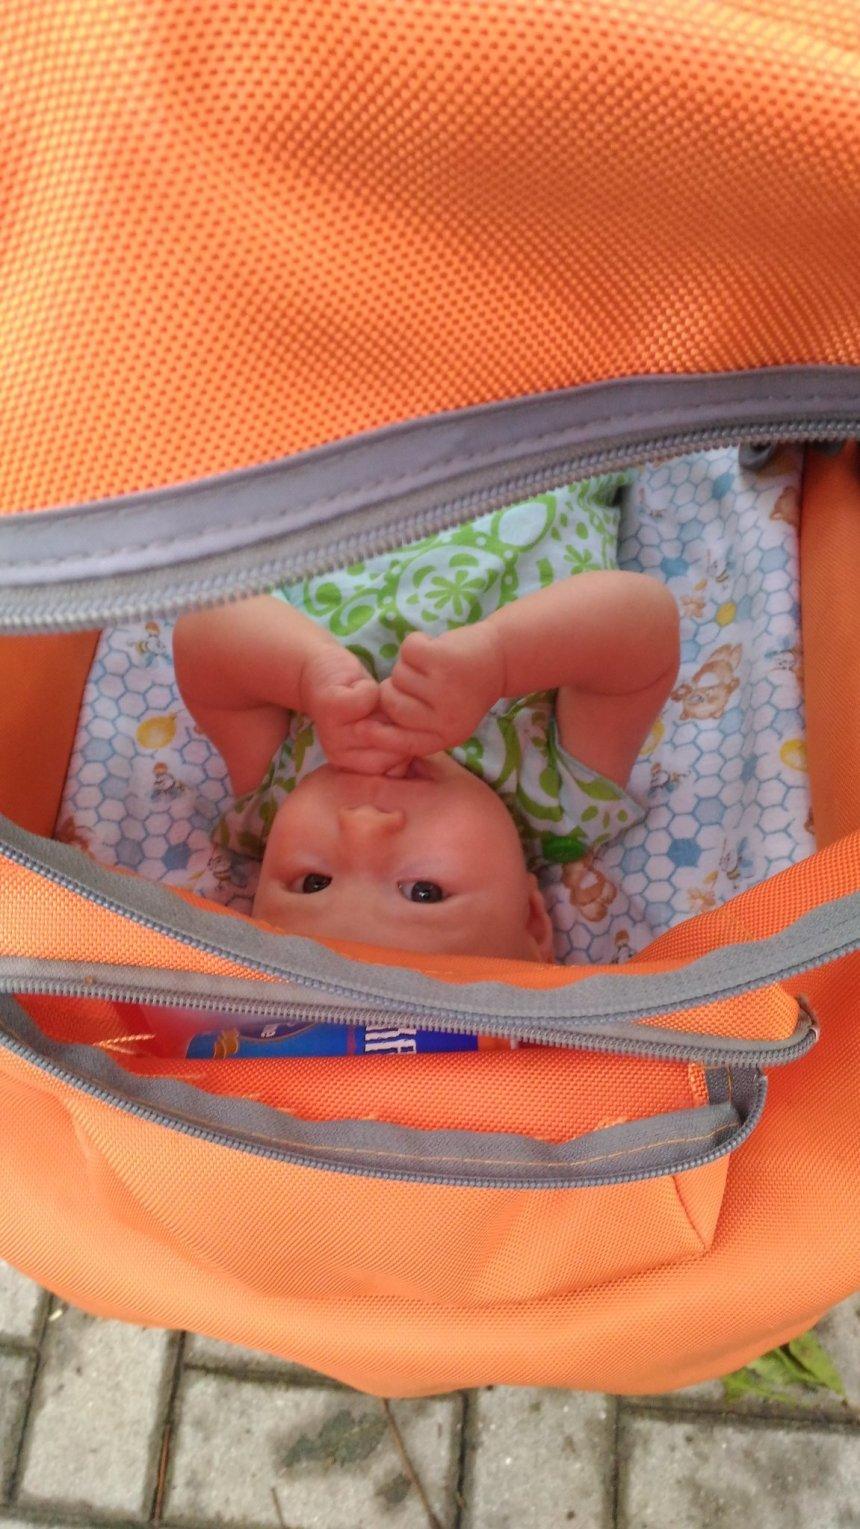 Отчёт по занятию Что может ребенок в три месяца в Wachanga!